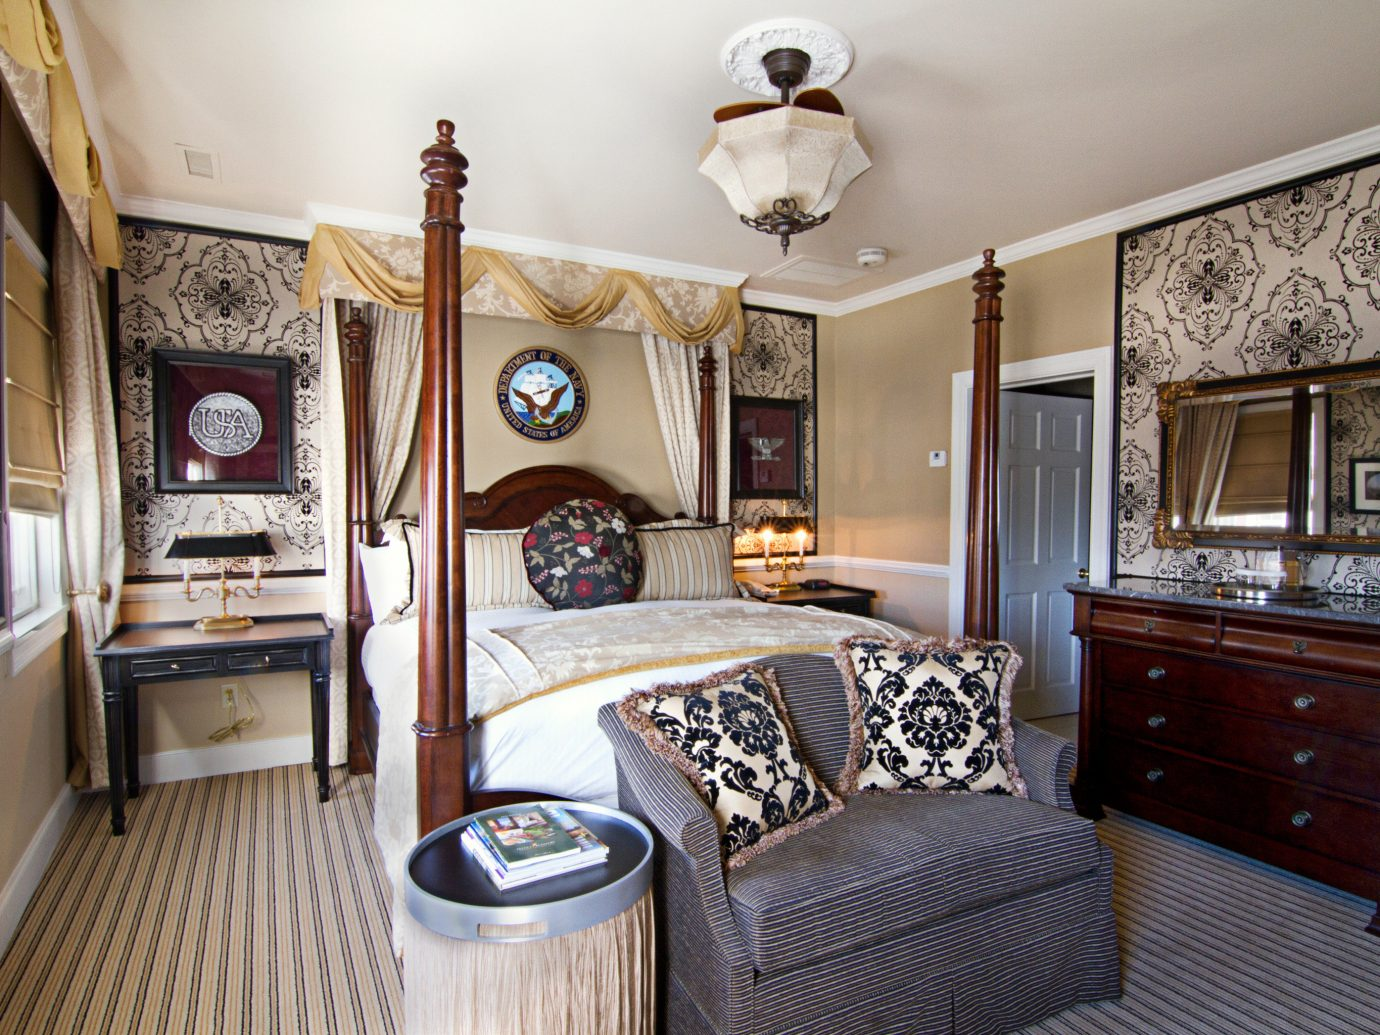 Bedroom at the Vendue Hotel in Charleston